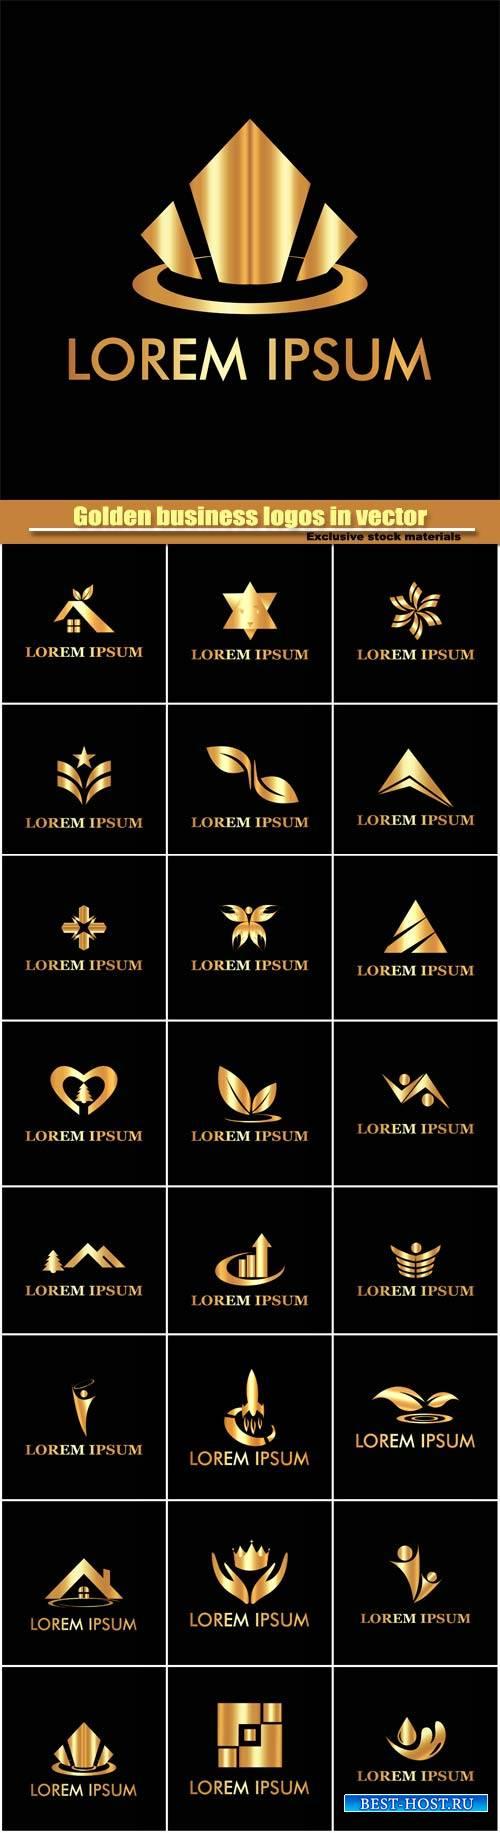 Stylish golden business logos in vector